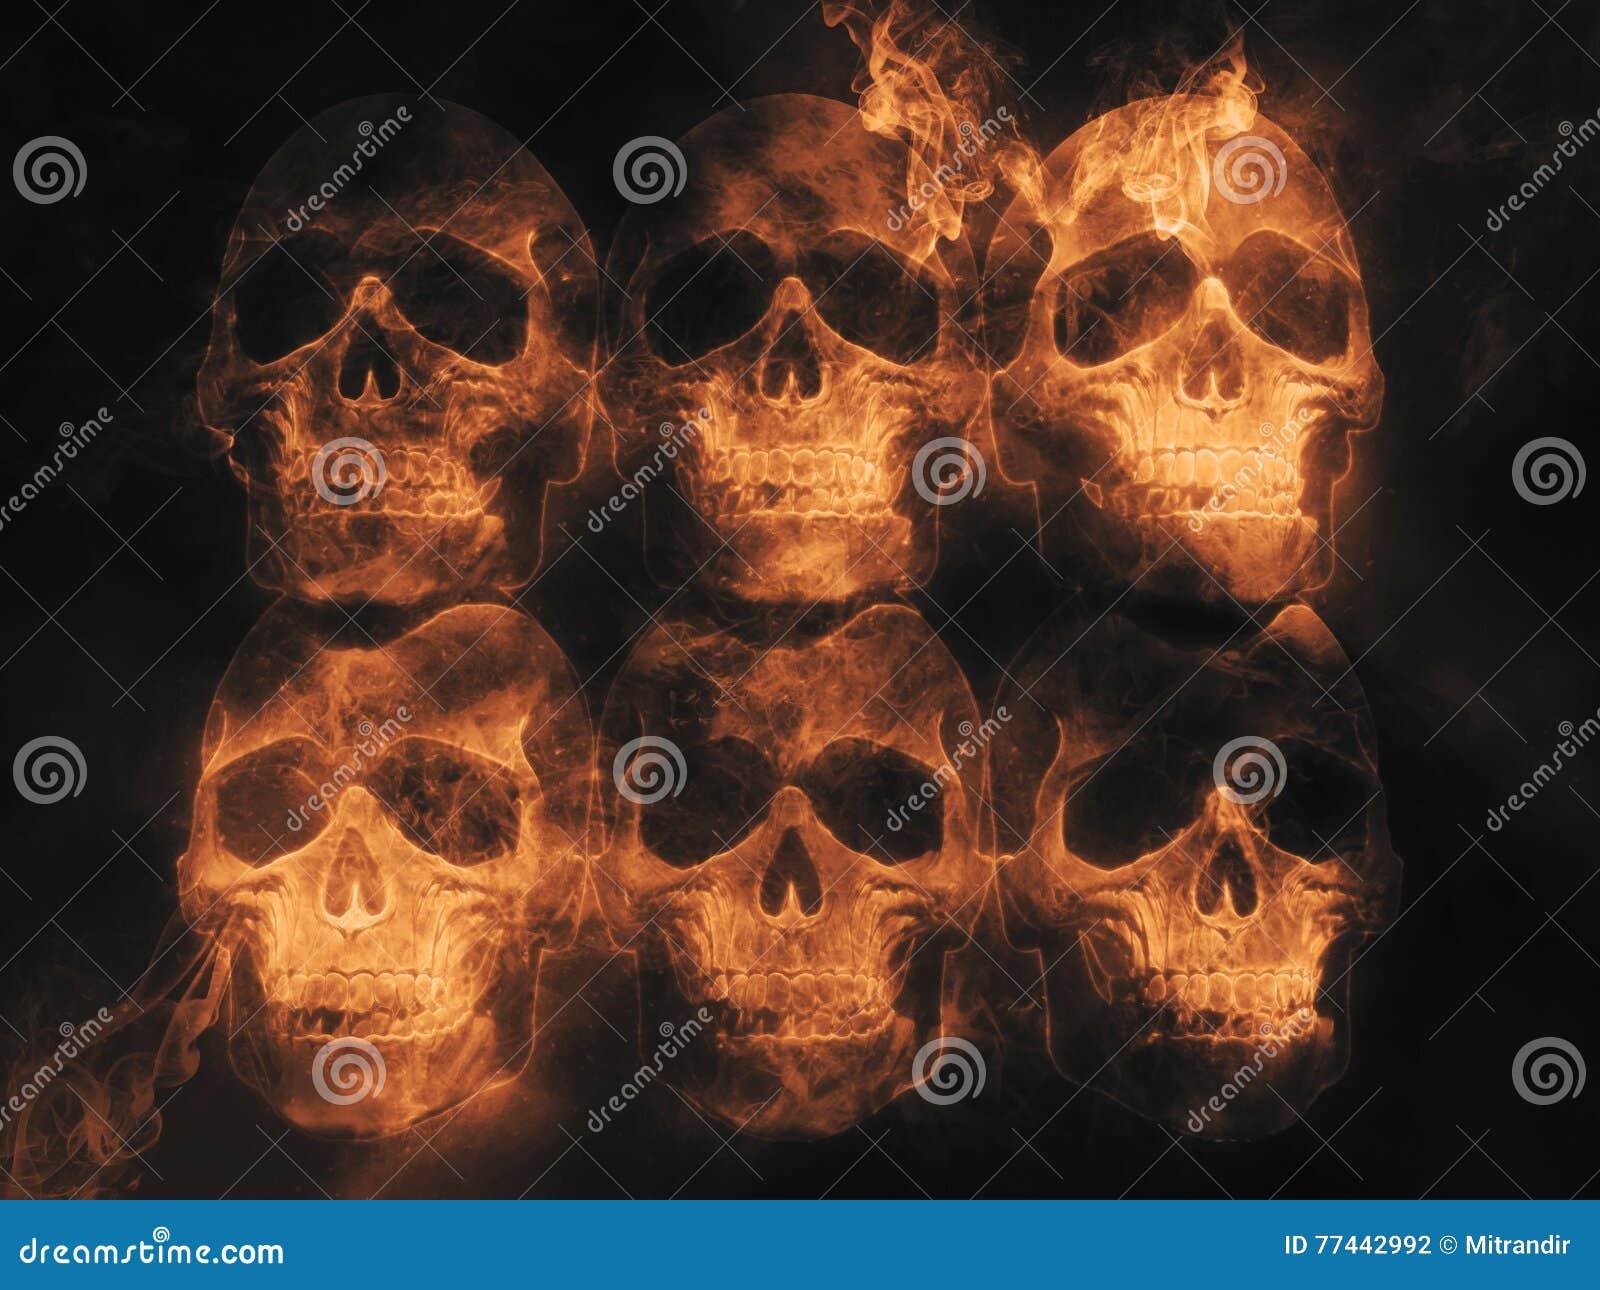 skulls fire and flame stock illustration illustration of bone